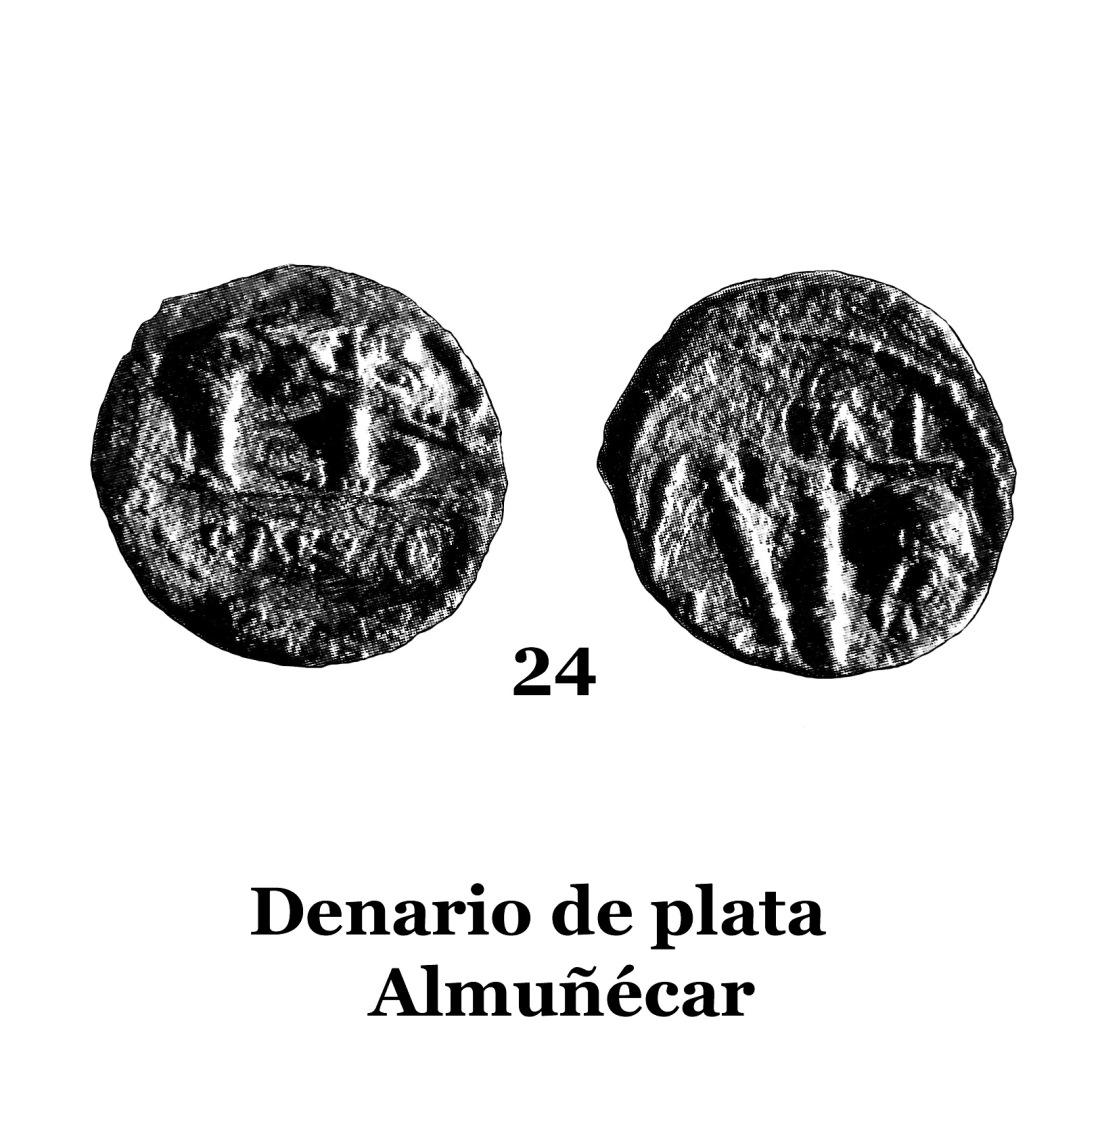 24Denario de plata de Almuñécar 24